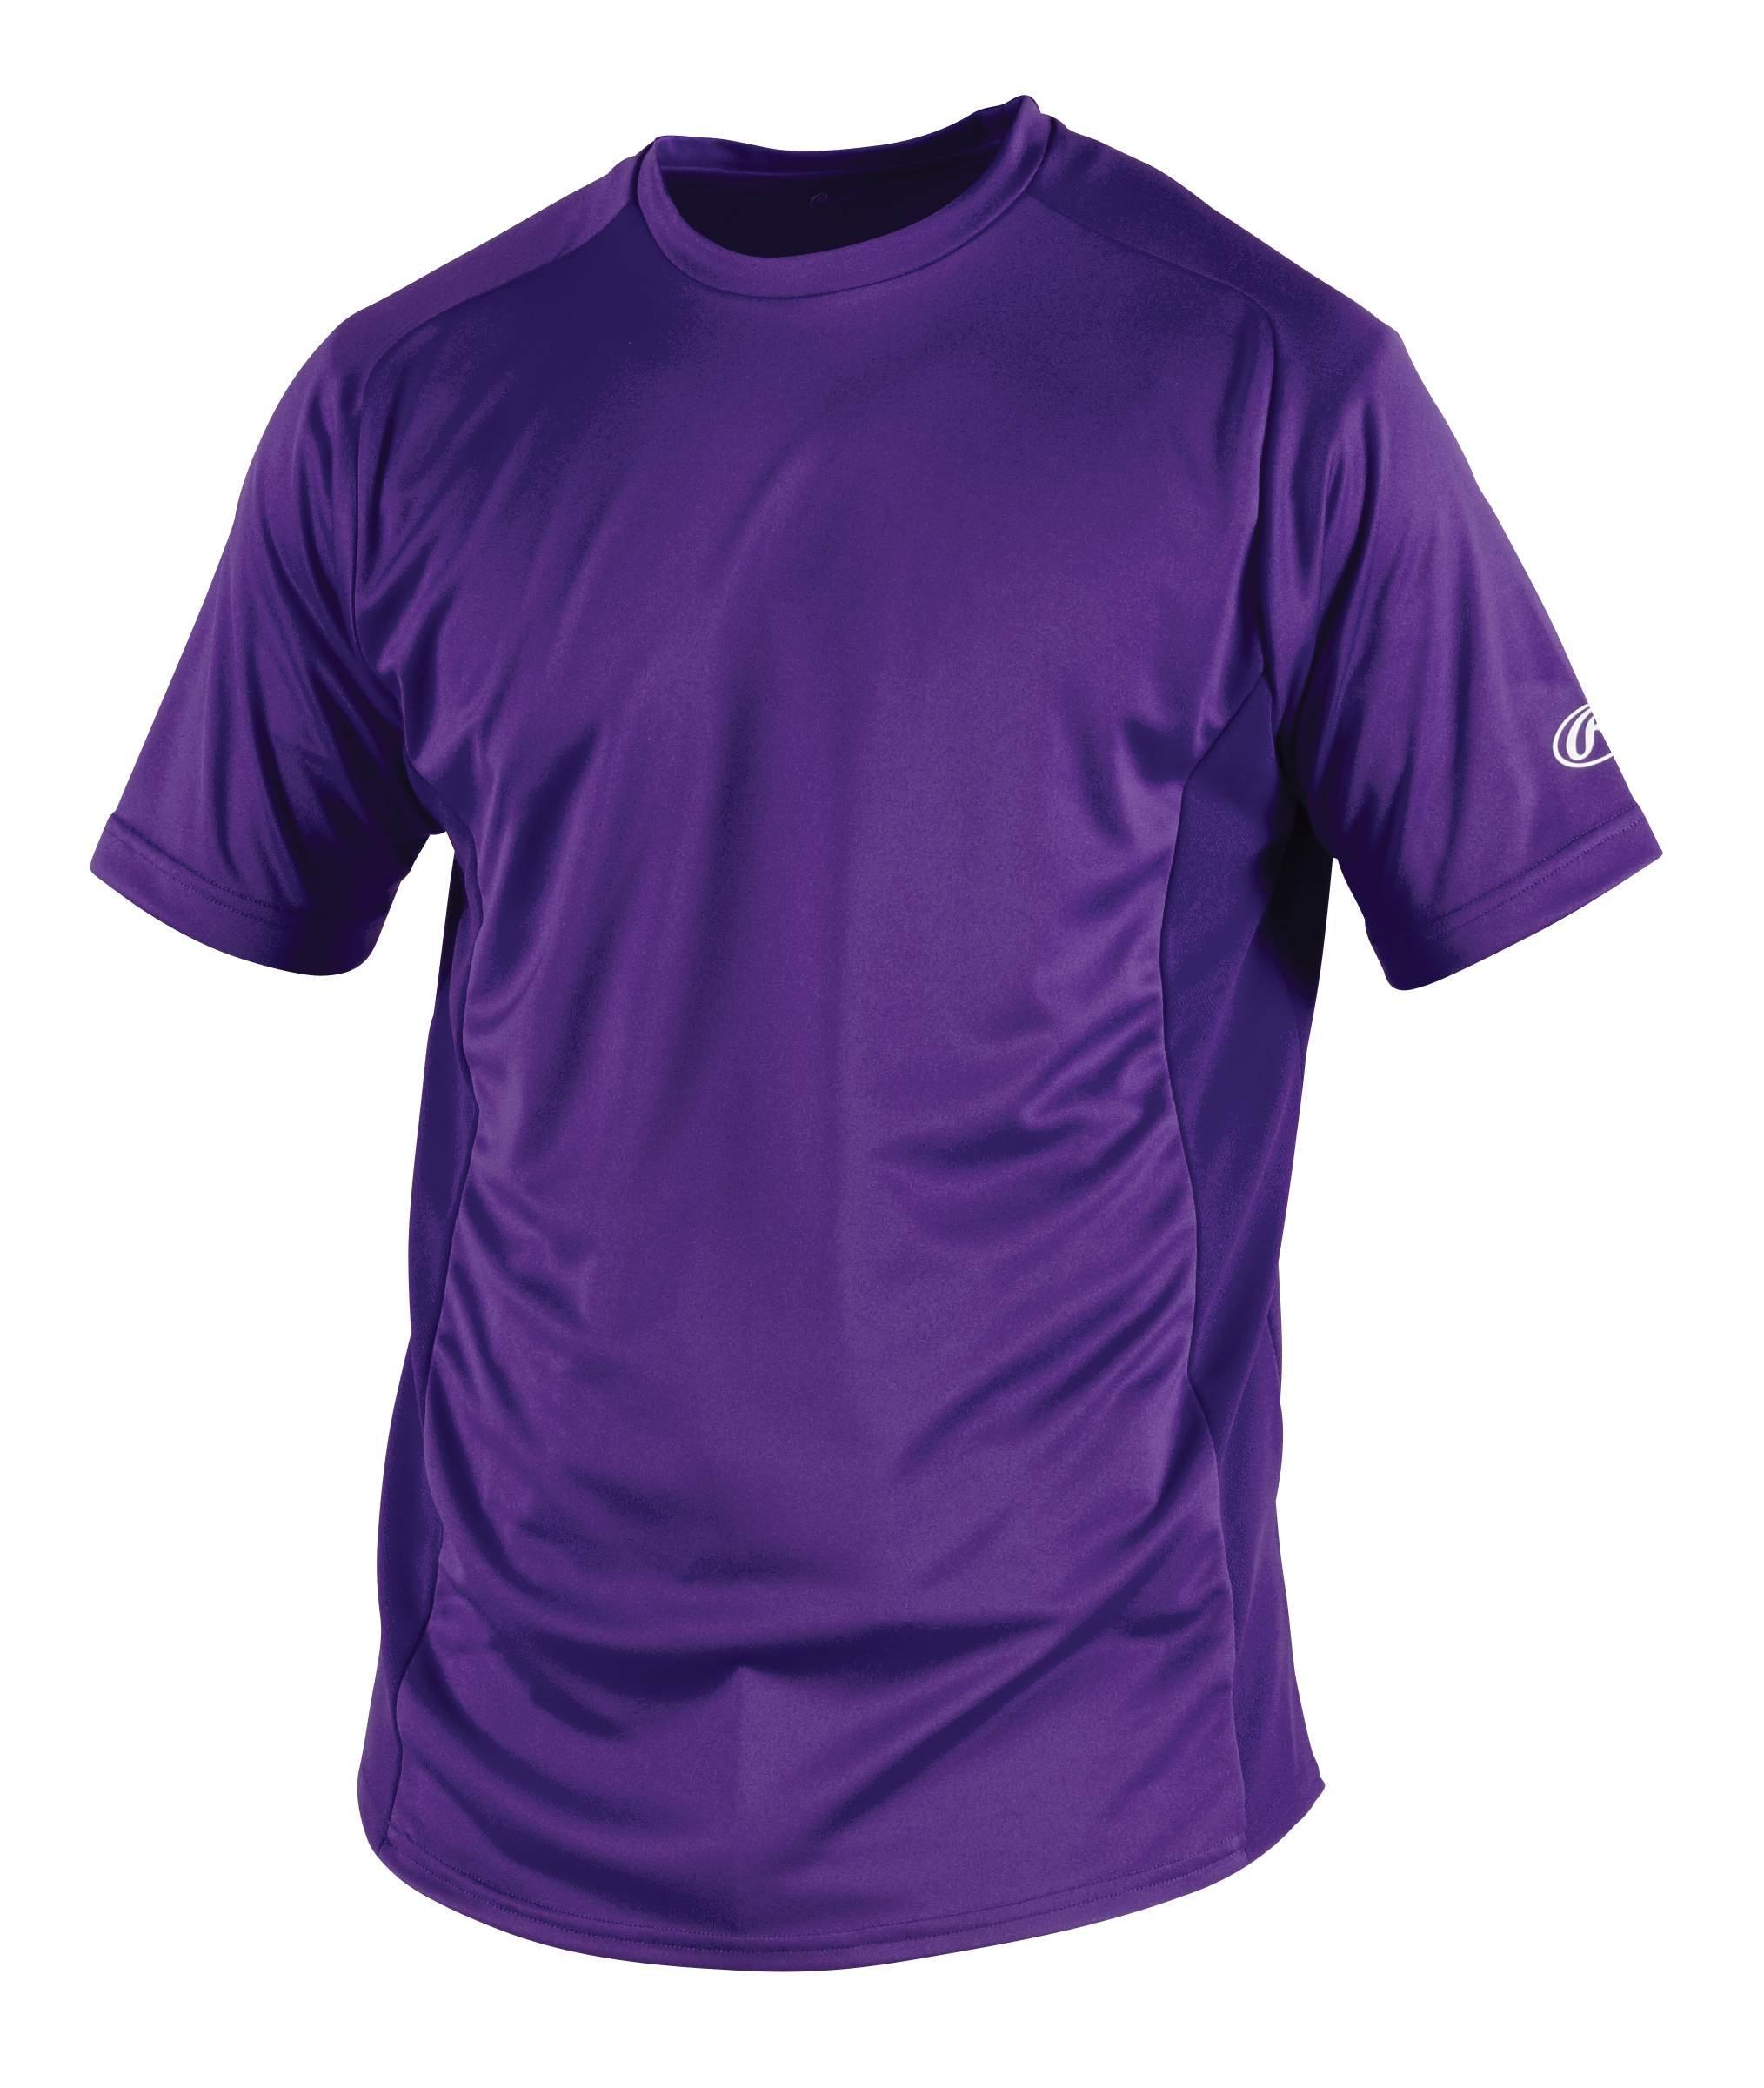 Rawlings Men's Short Sleeve Baselayer Shirt, Purple, Large by Rawlings